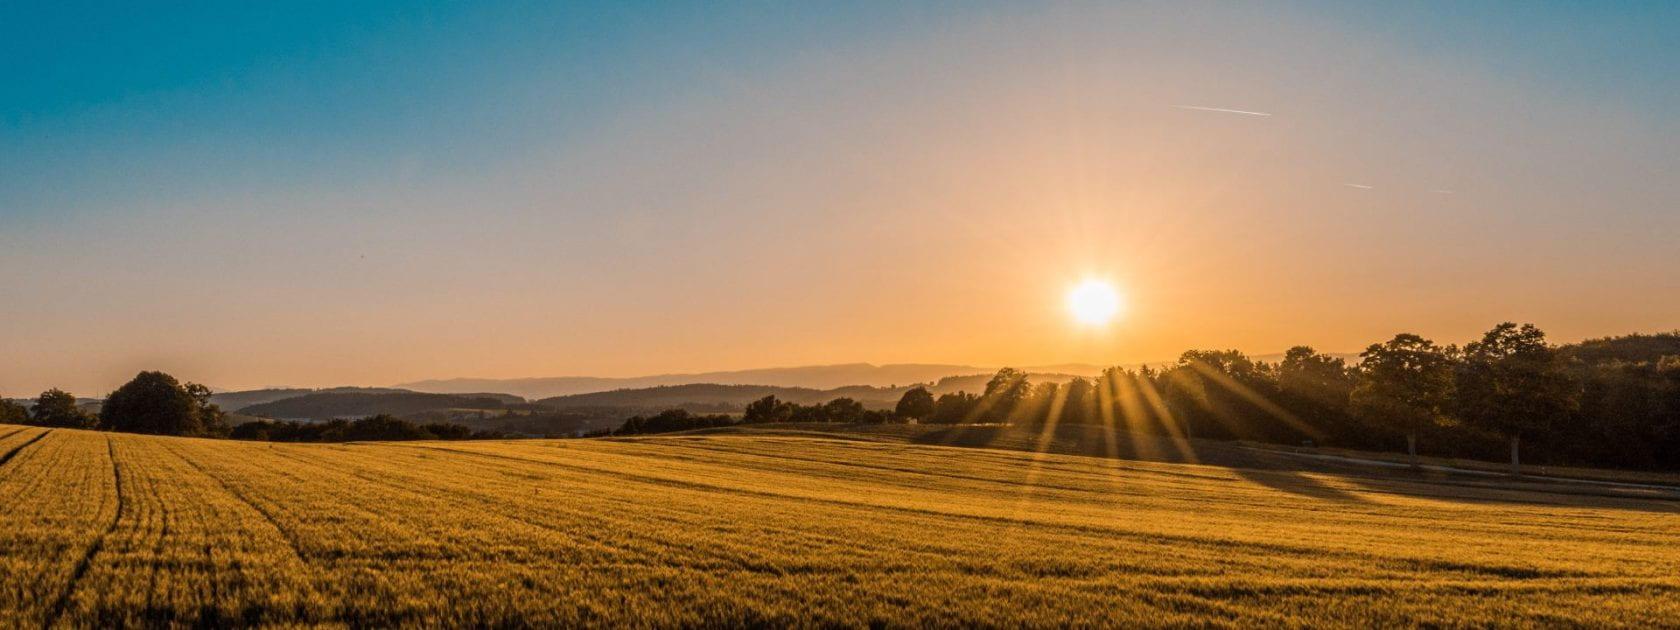 Image shows a farm landscape and a sunset